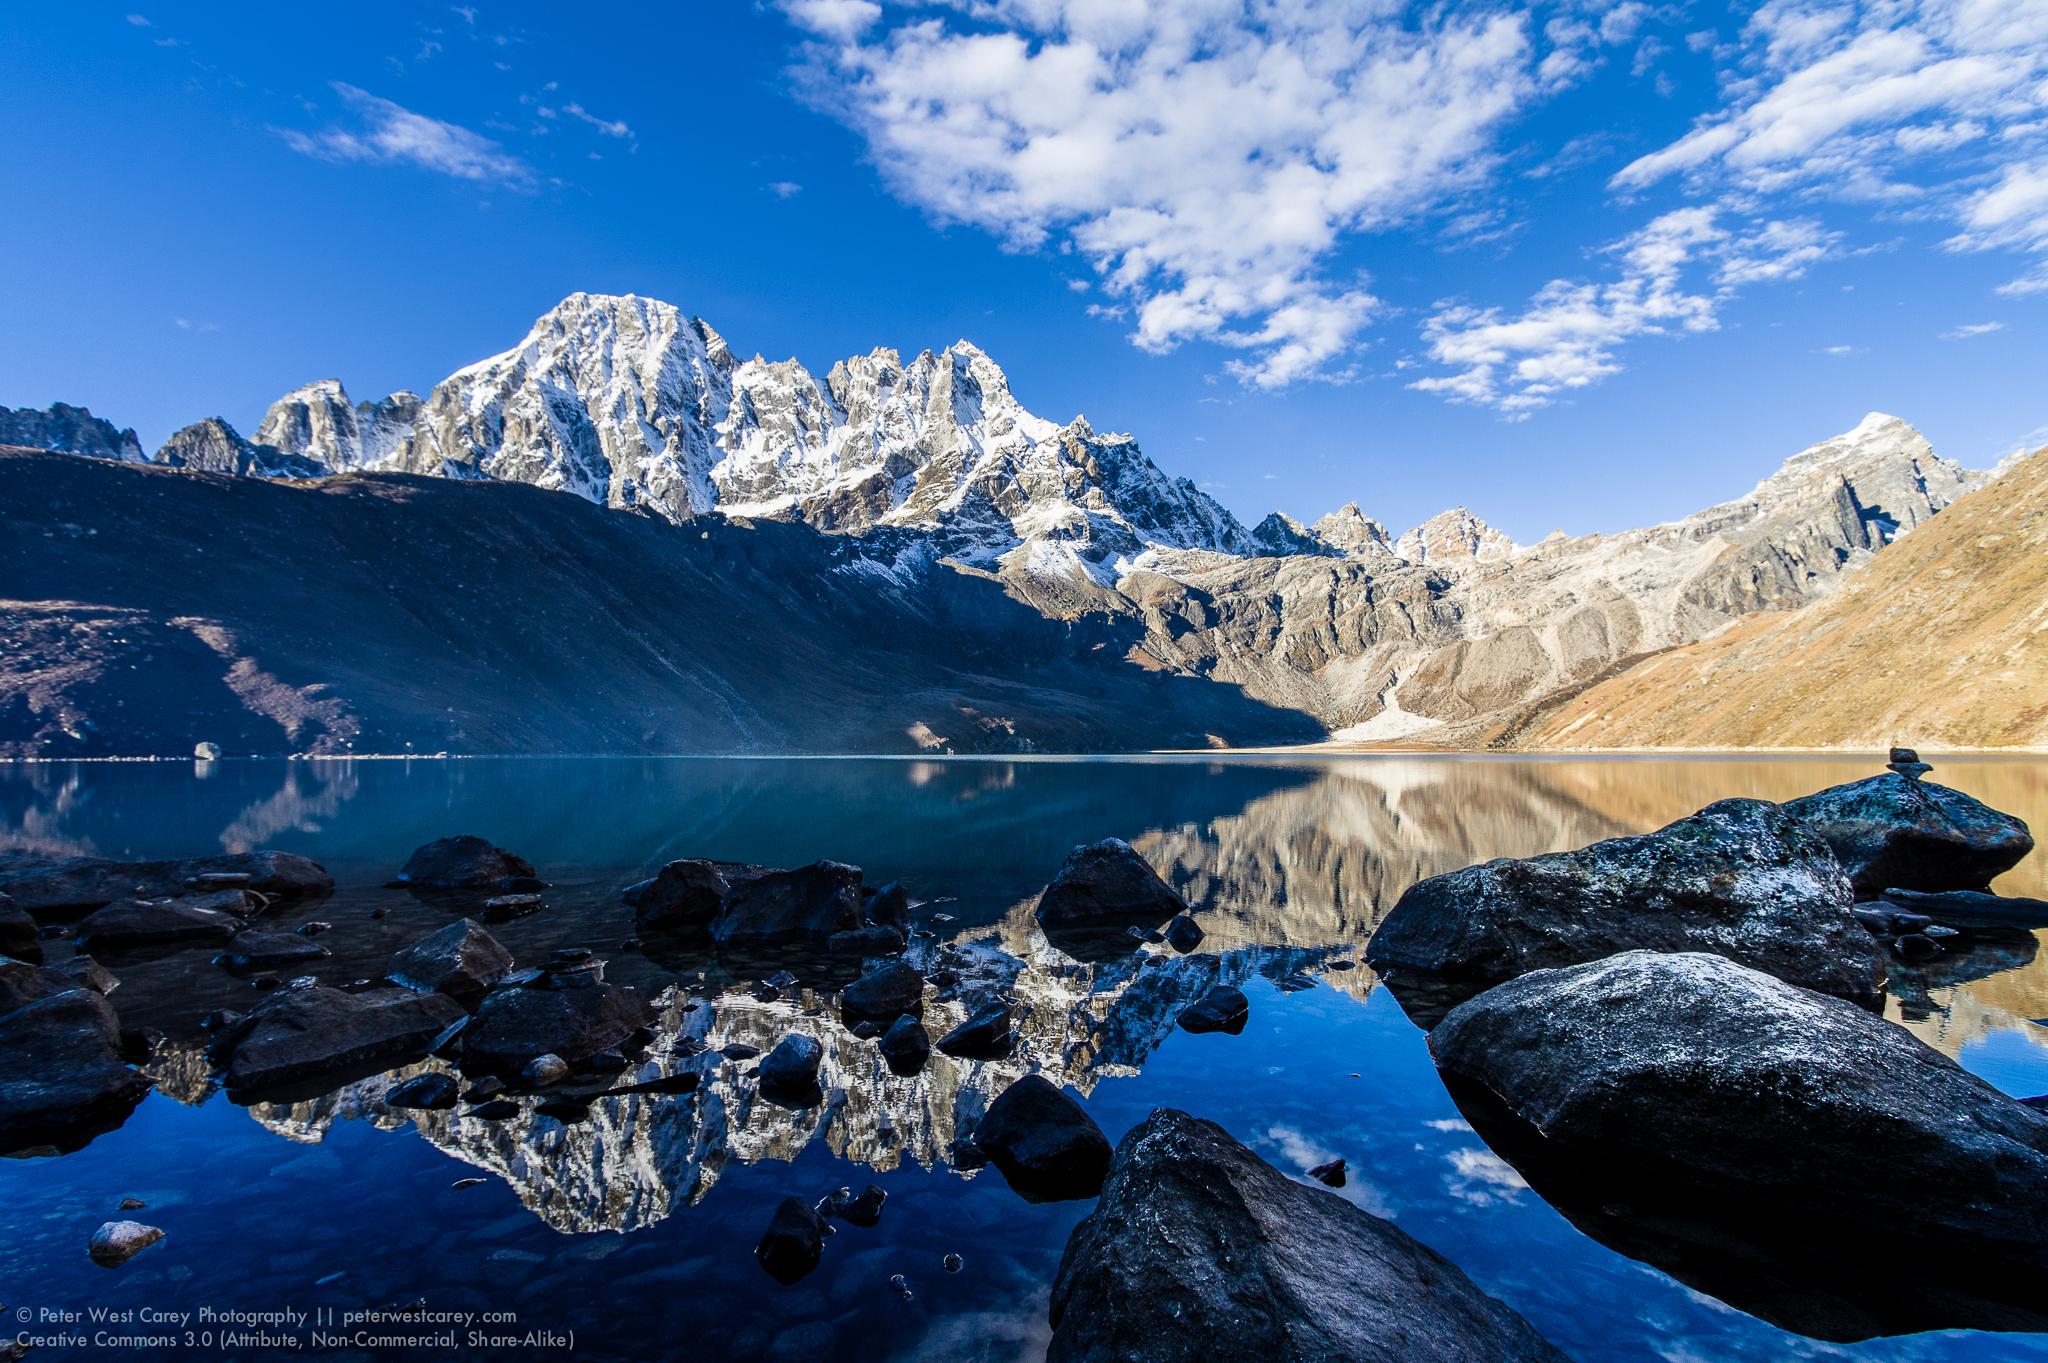 The Machermo Range Reflected In Dudh Pokhari, Gokyo, Solukhumbu,